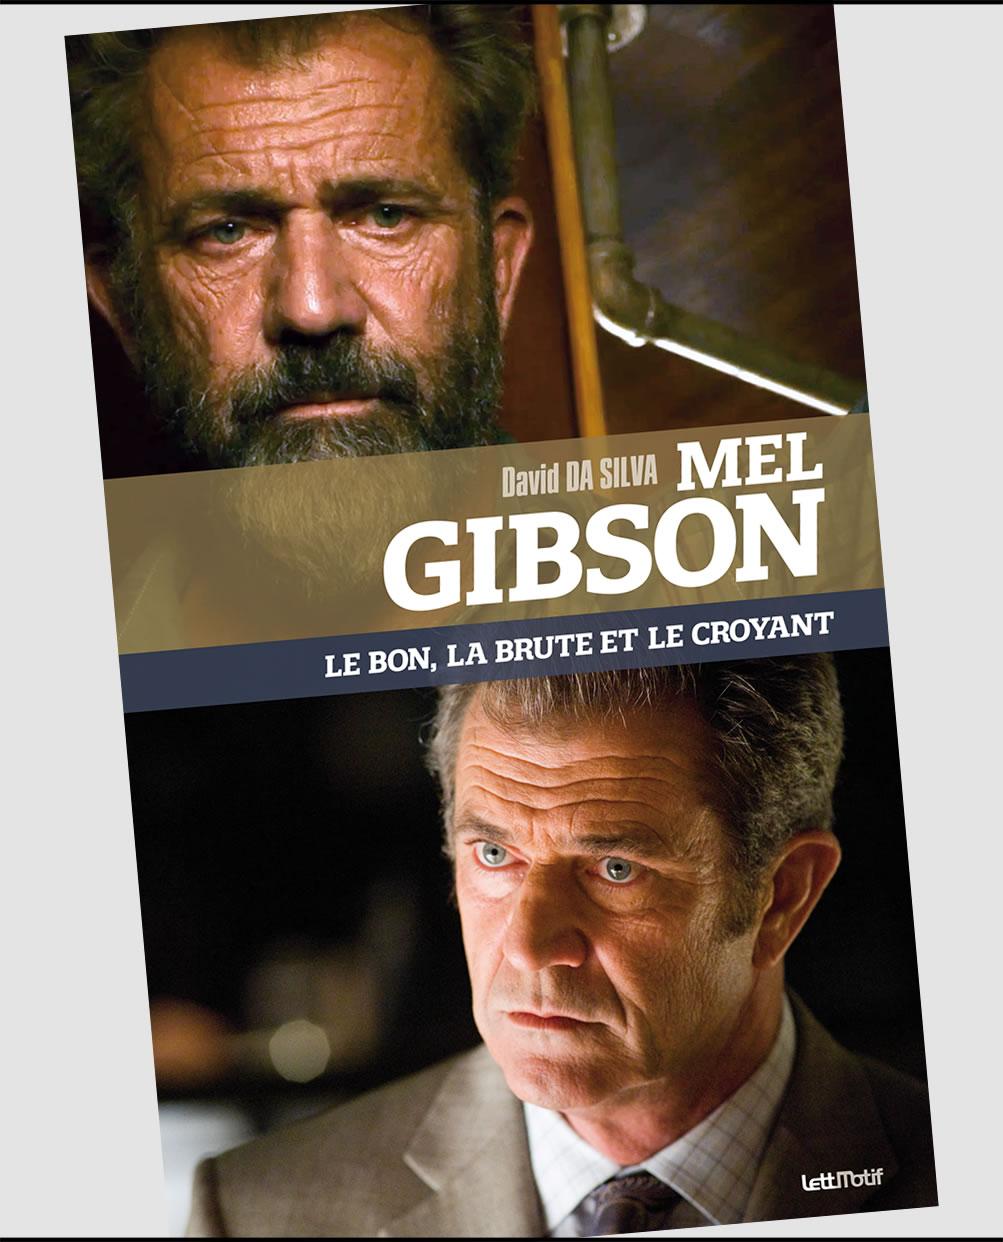 gibson-couv-500x621.jpg